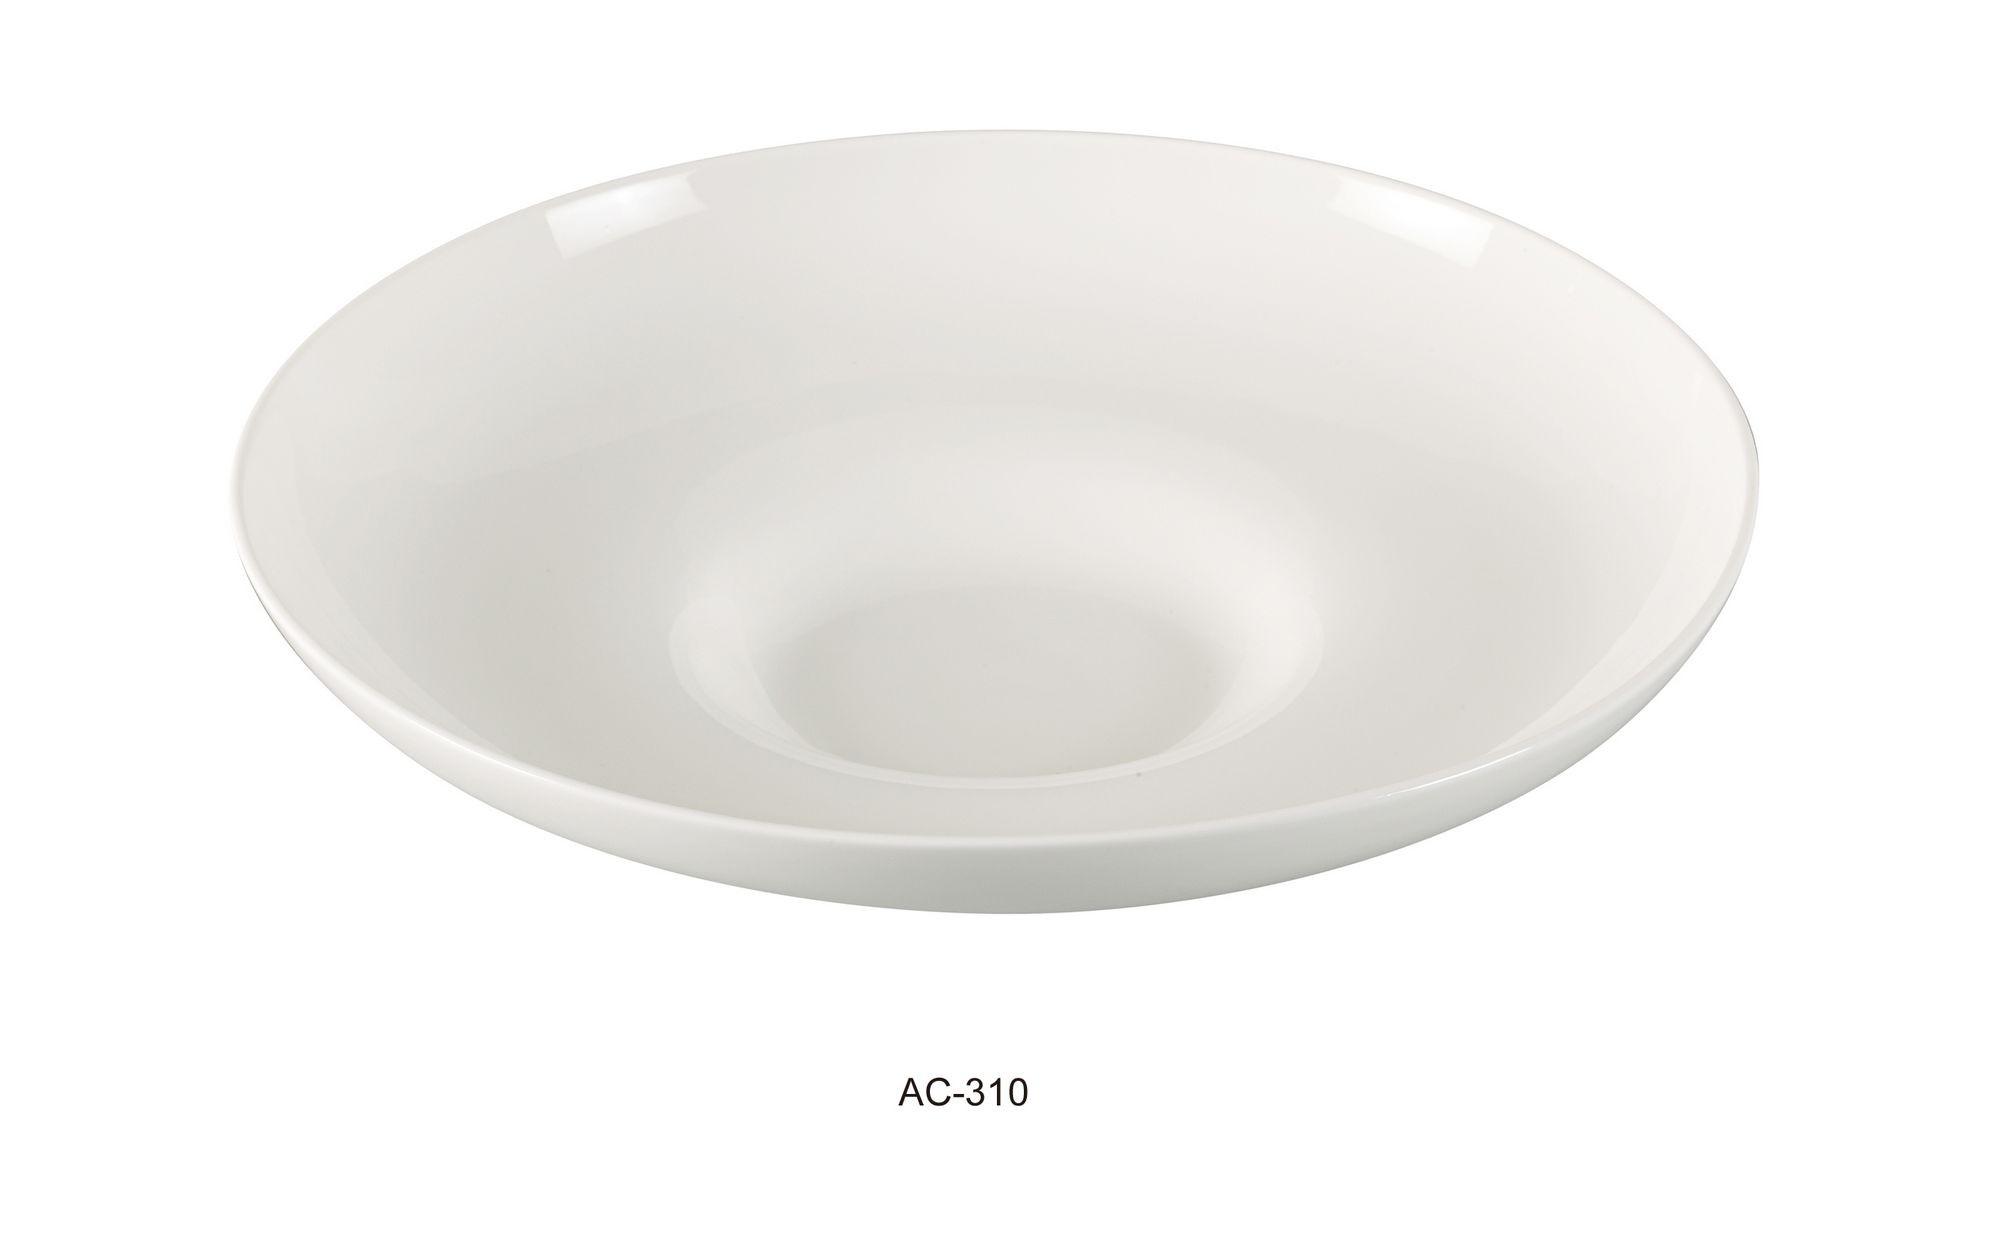 "Yanco AC-310 Abco 10 1/2"" x 2"" Mediterranean Pasta Bowl 18 oz."